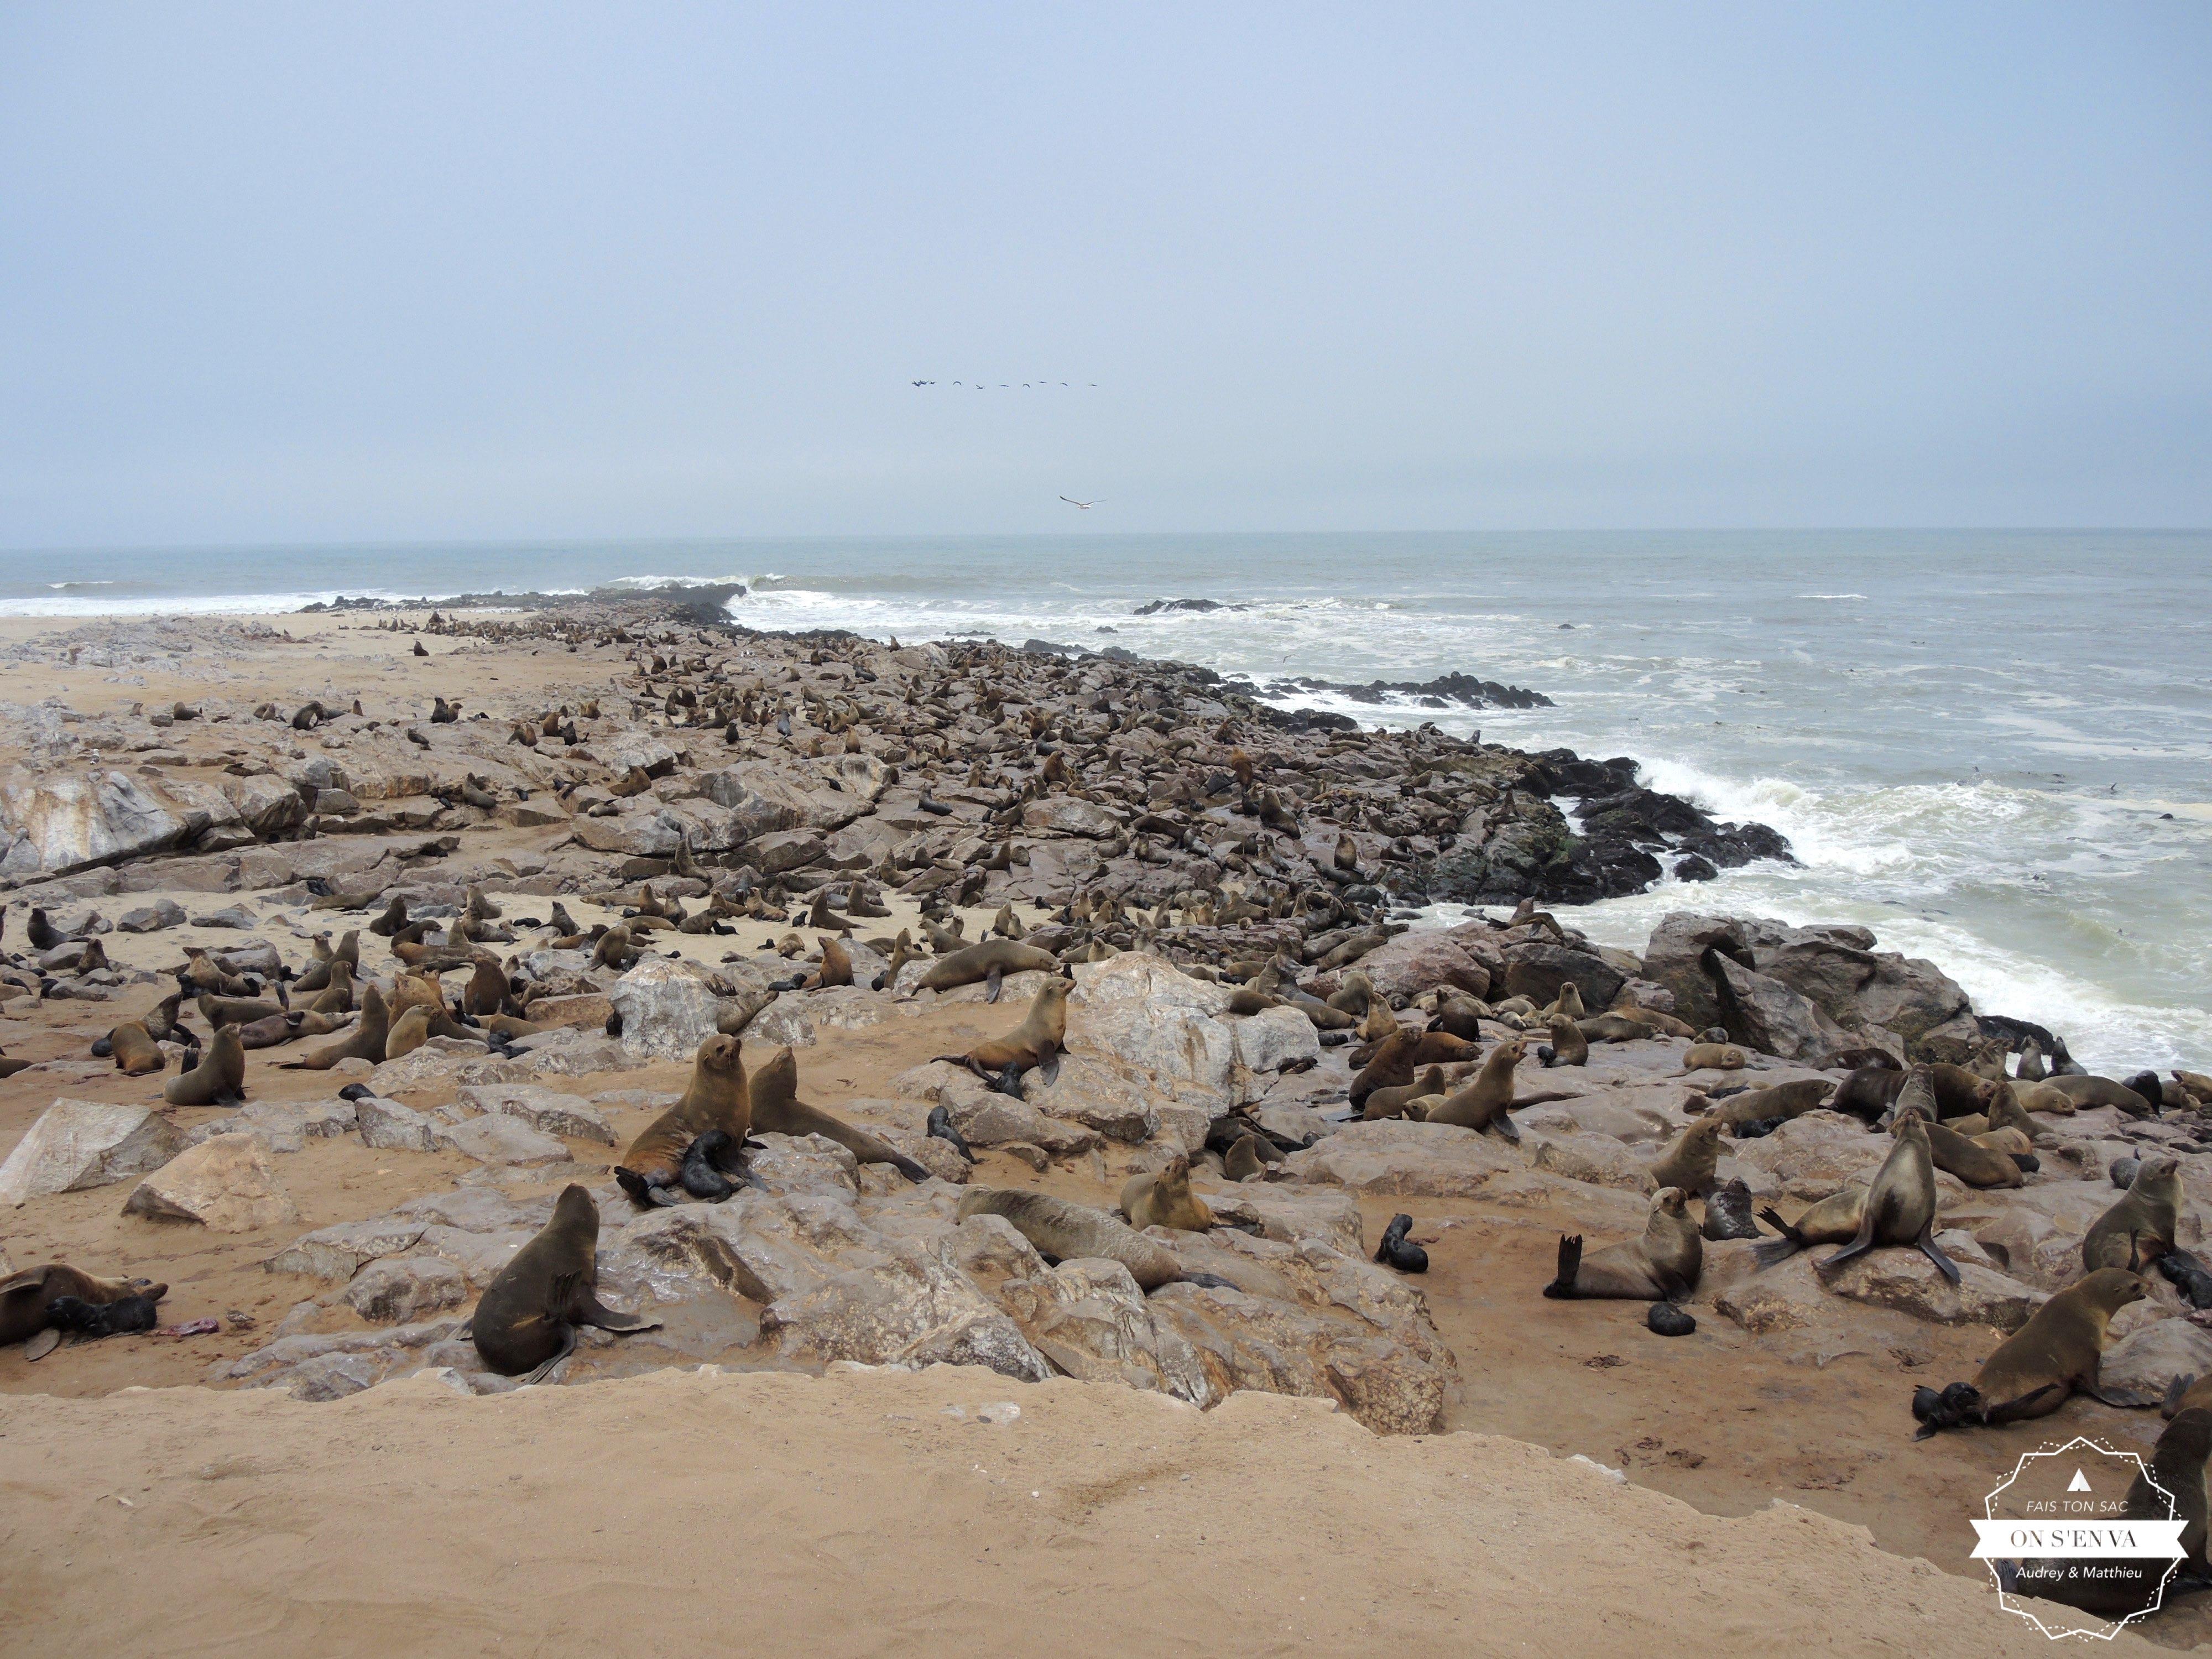 Les phoques de Cape Cross